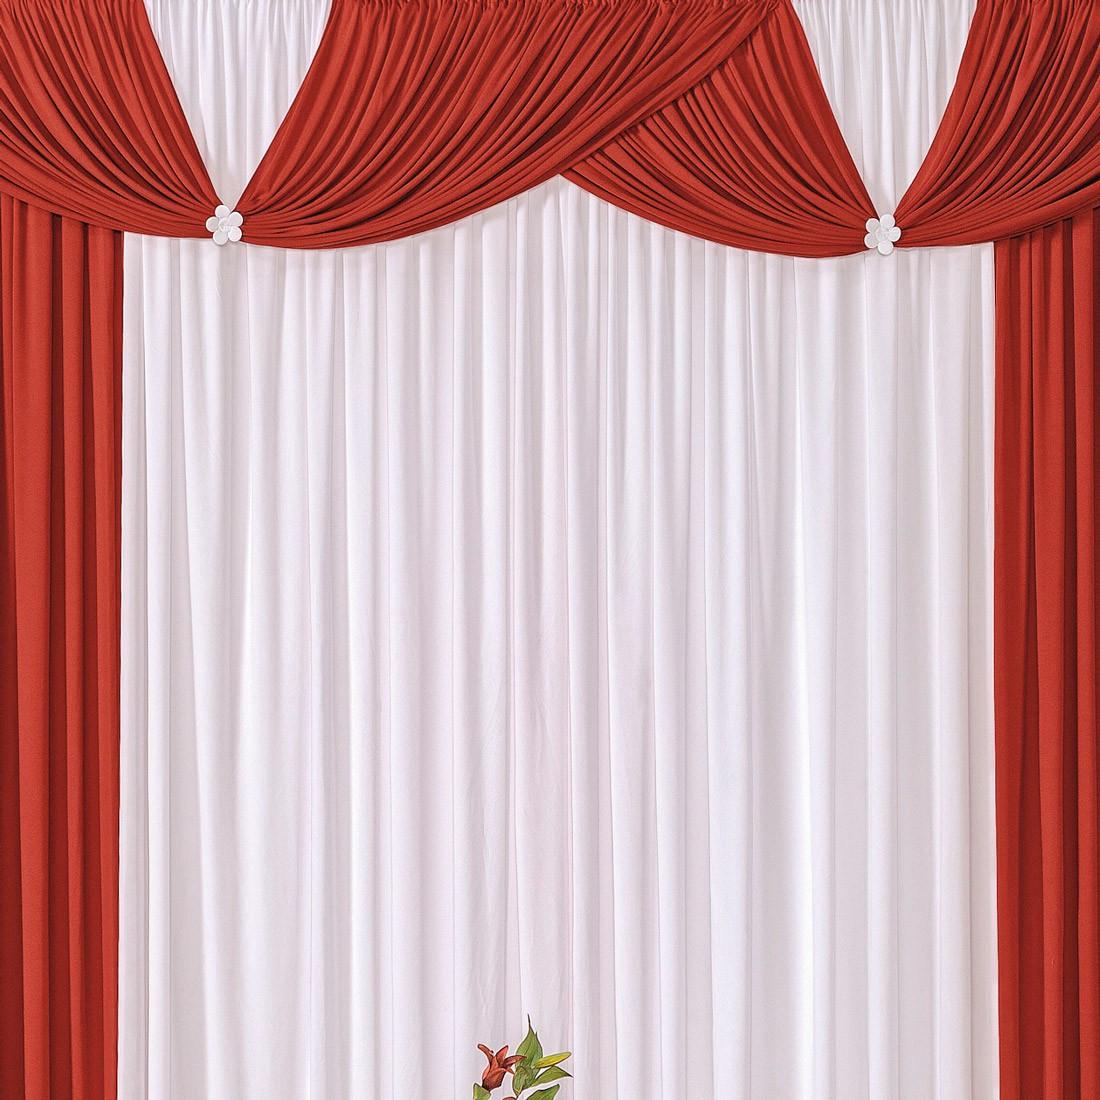 Cortina Londrina Vermelho/Branco 2,00m X 1,70m p/ Varão Simples